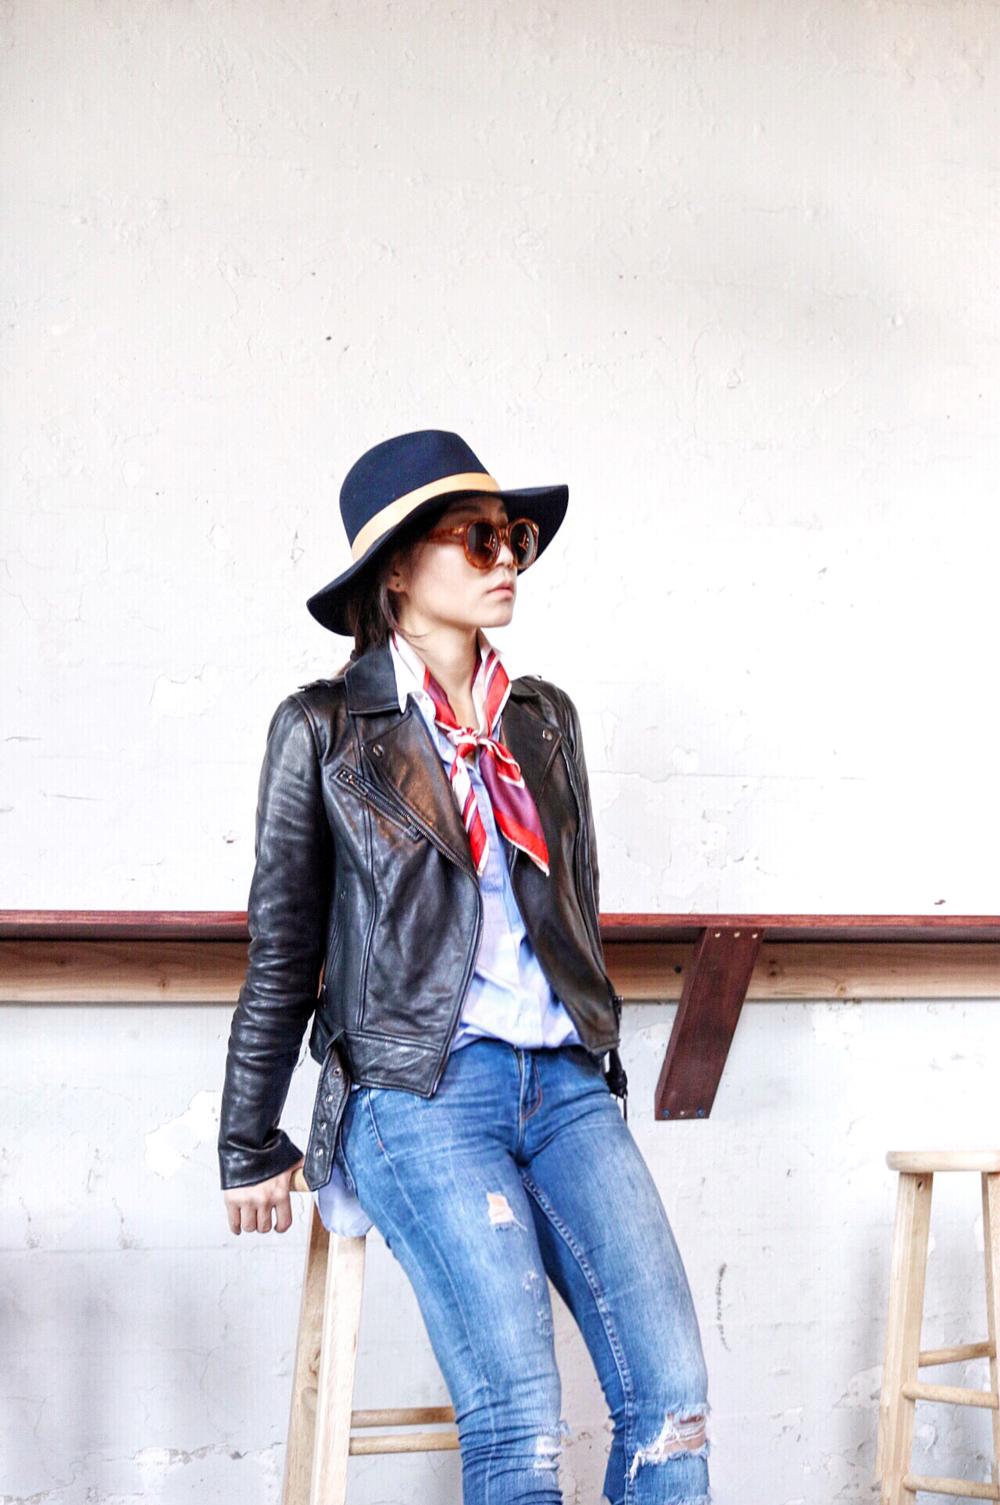 Janessa Leone Hat, Urbanoutfitters Sunglasses, Zara Shirt, Zara Jeans, Soia & Kyo Leather Jacket, Vintage Scarf